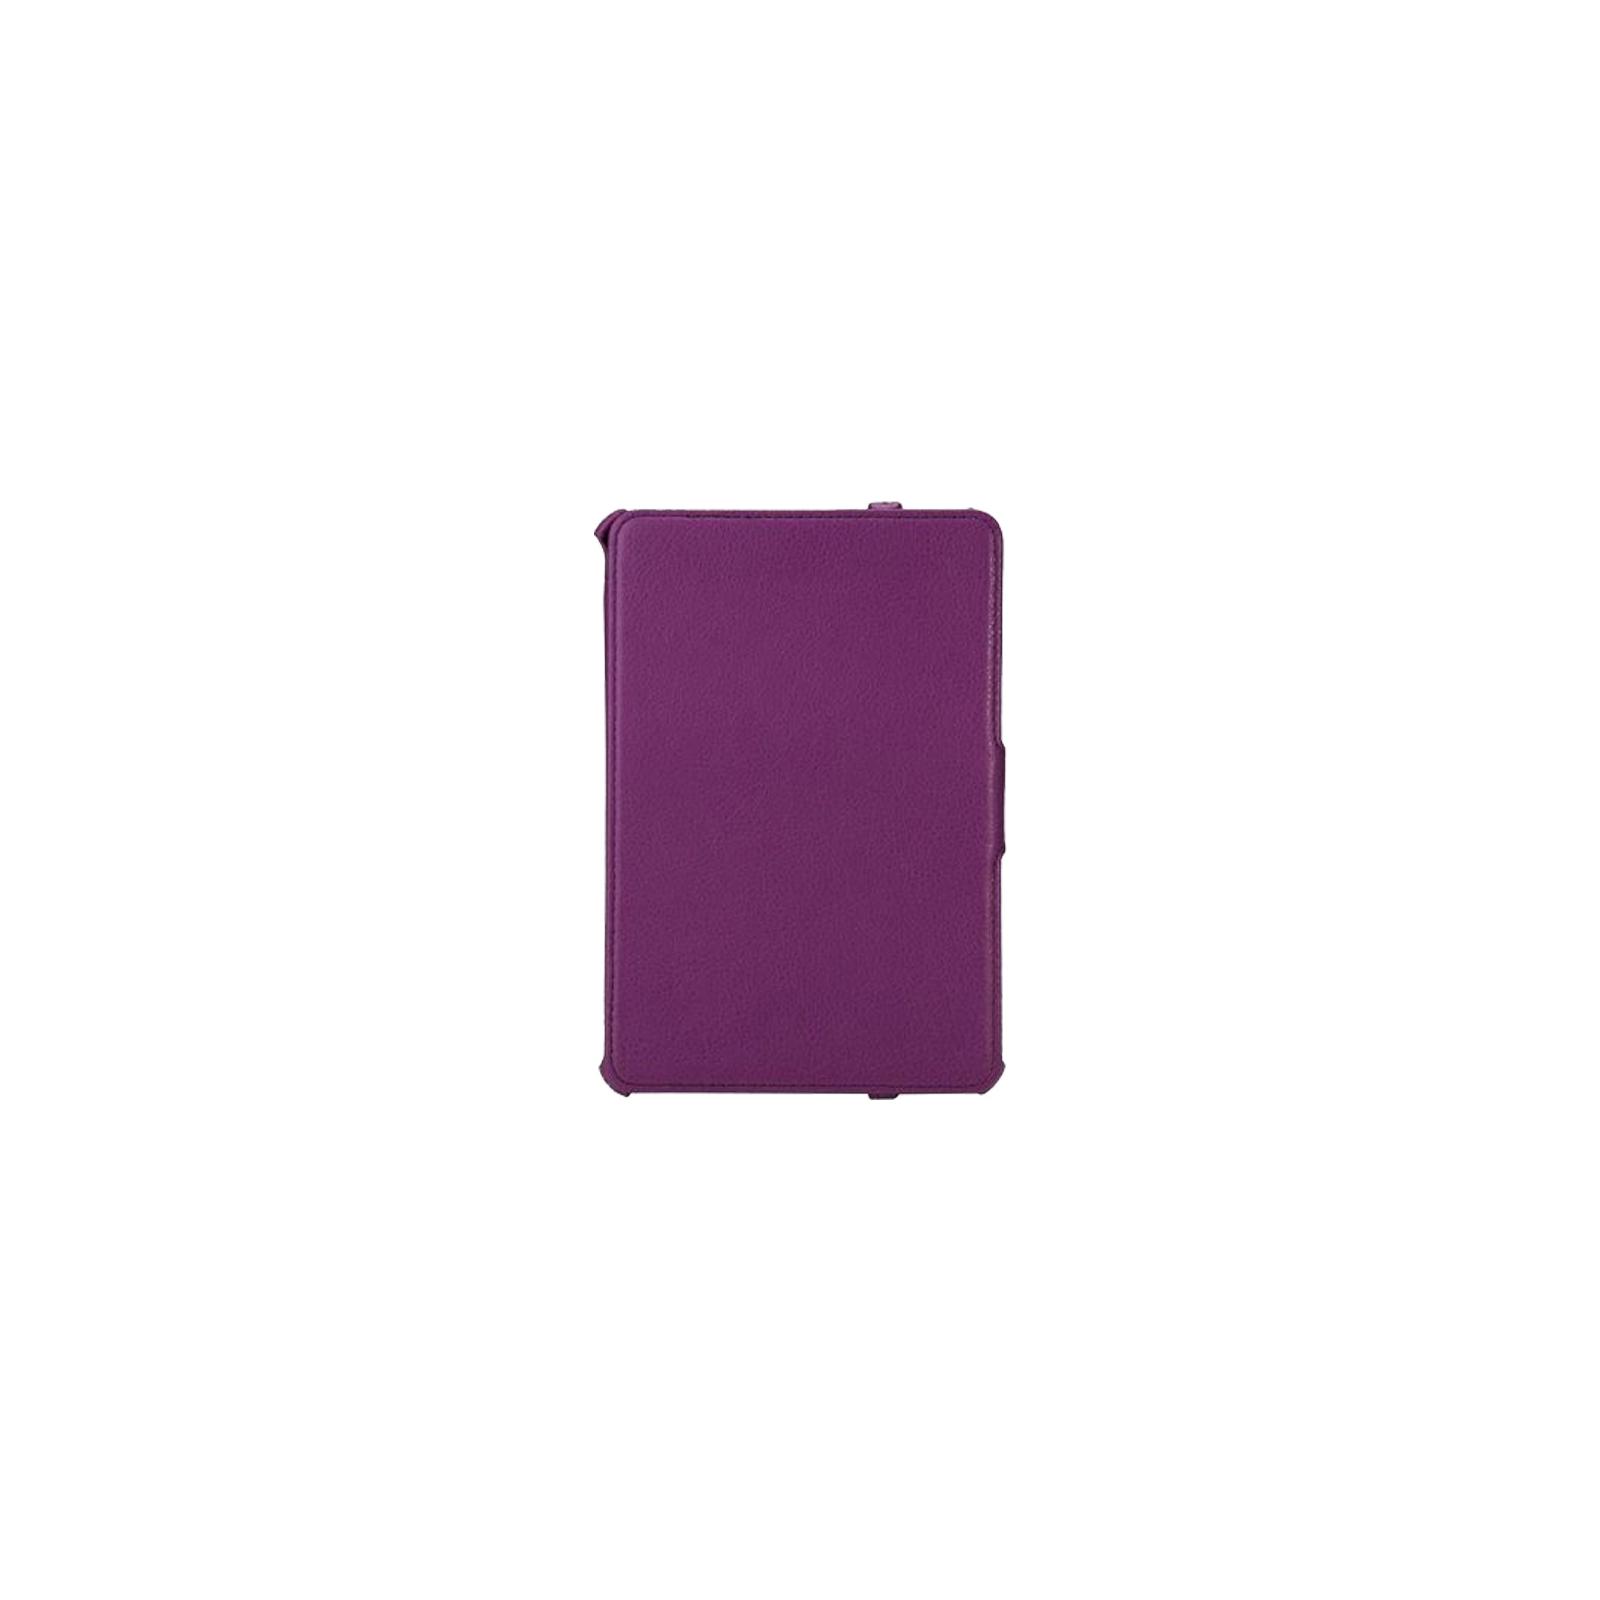 Чехол для планшета AirOn для Samsung Galaxy Tab S 2 8.0 violet (4822352770204)